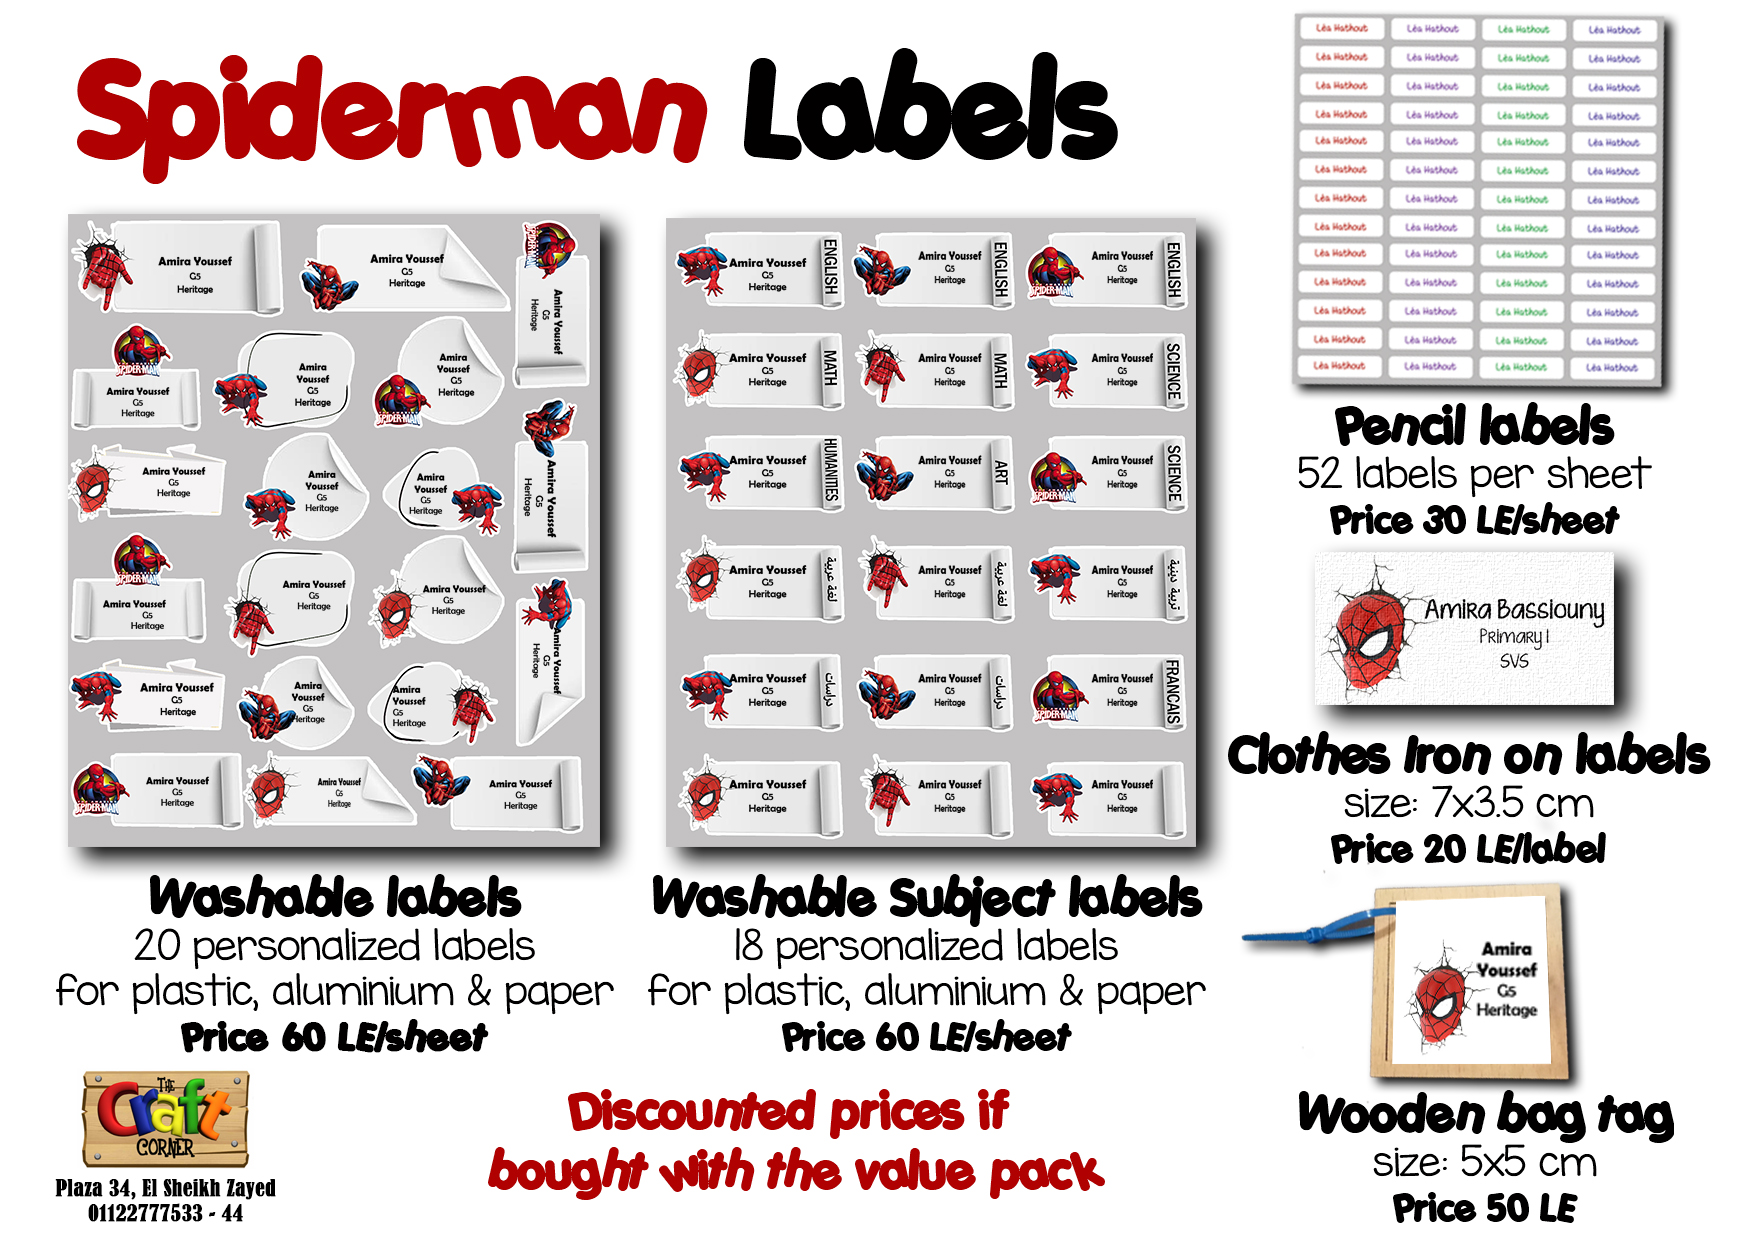 spiderman Labels